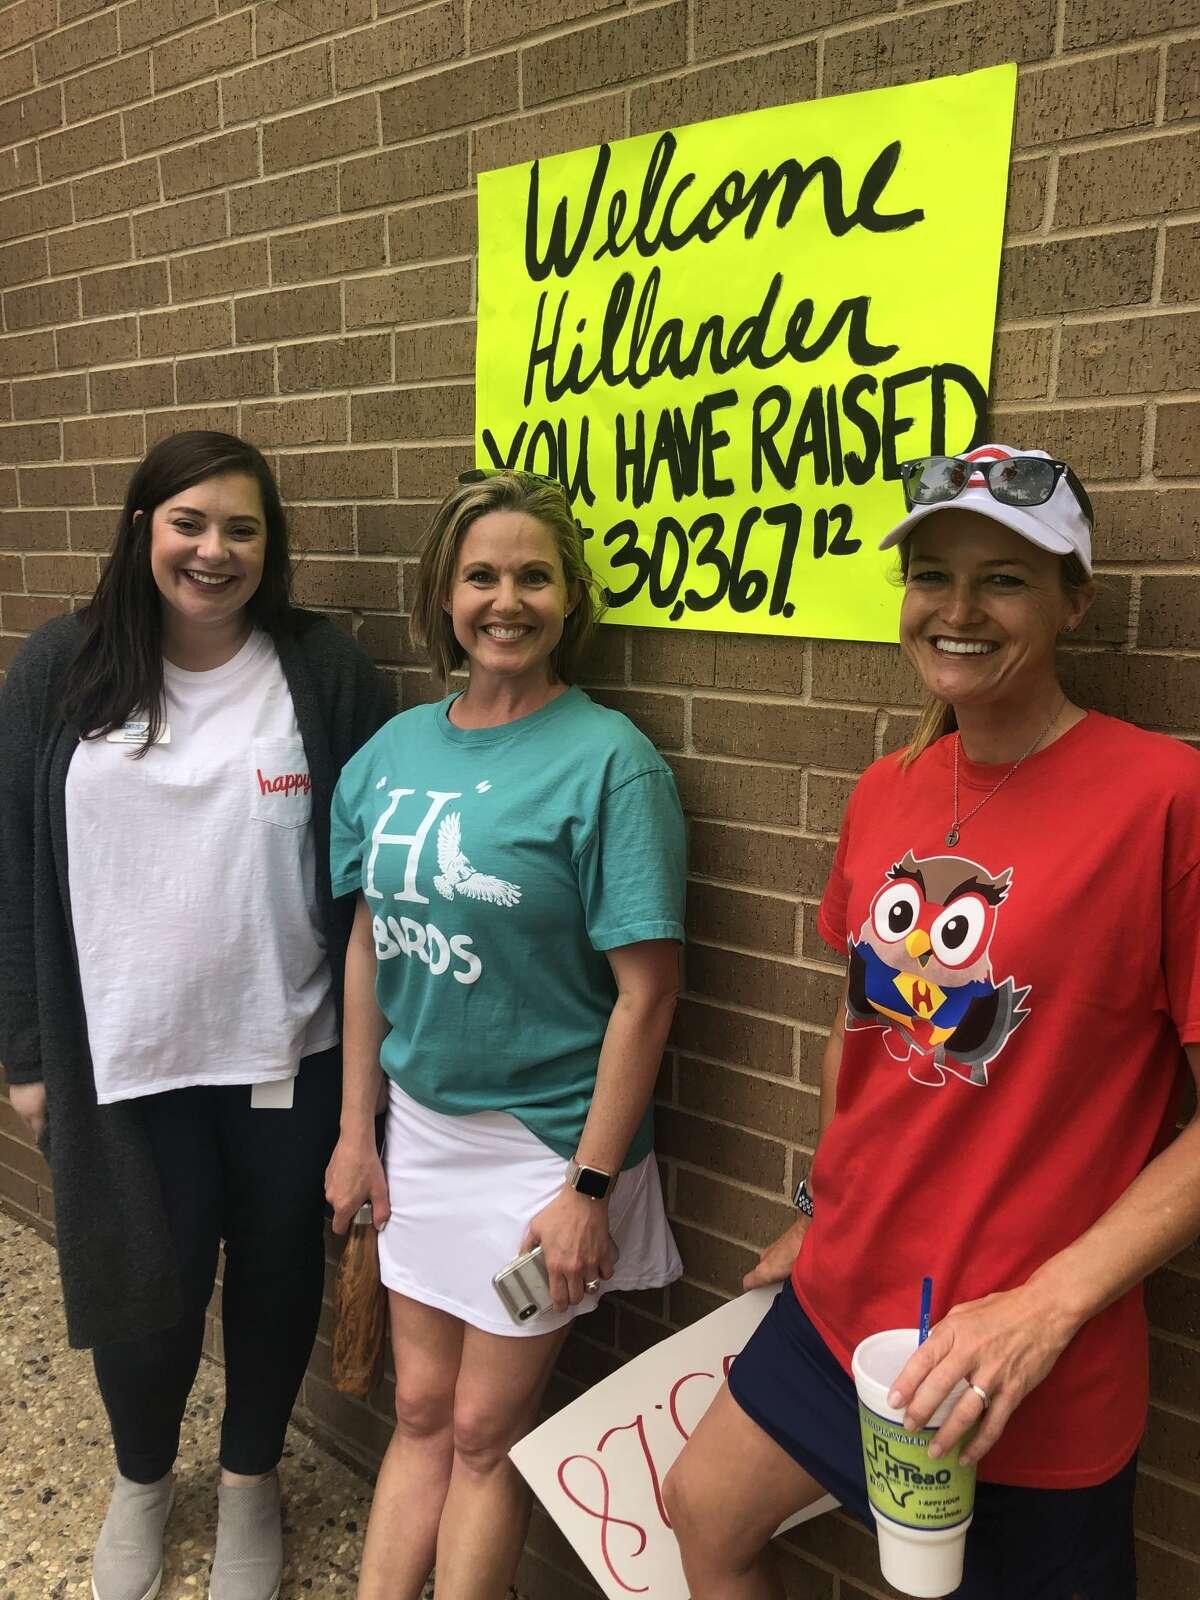 Hillander-MCRC: Cecelia Quinn, from left, Jessica Nosek and Becca Heidelberg